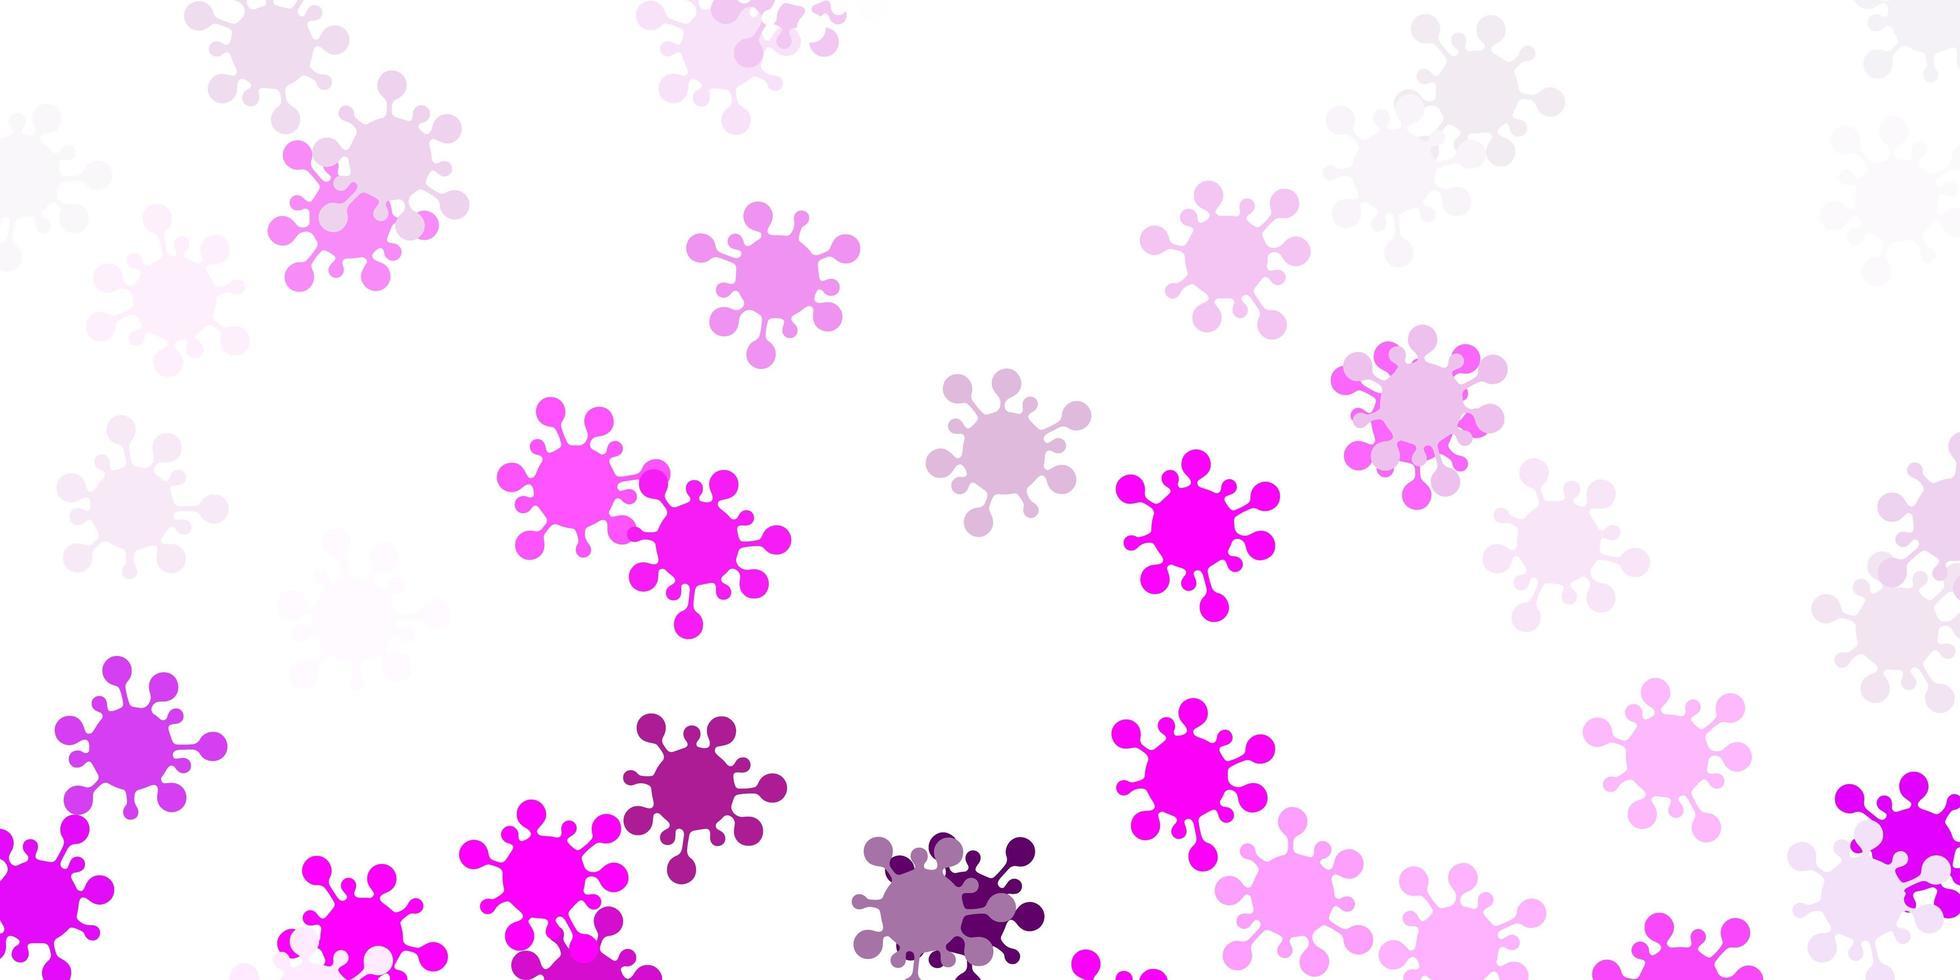 Light purple, pink vector backdrop with virus symbols.